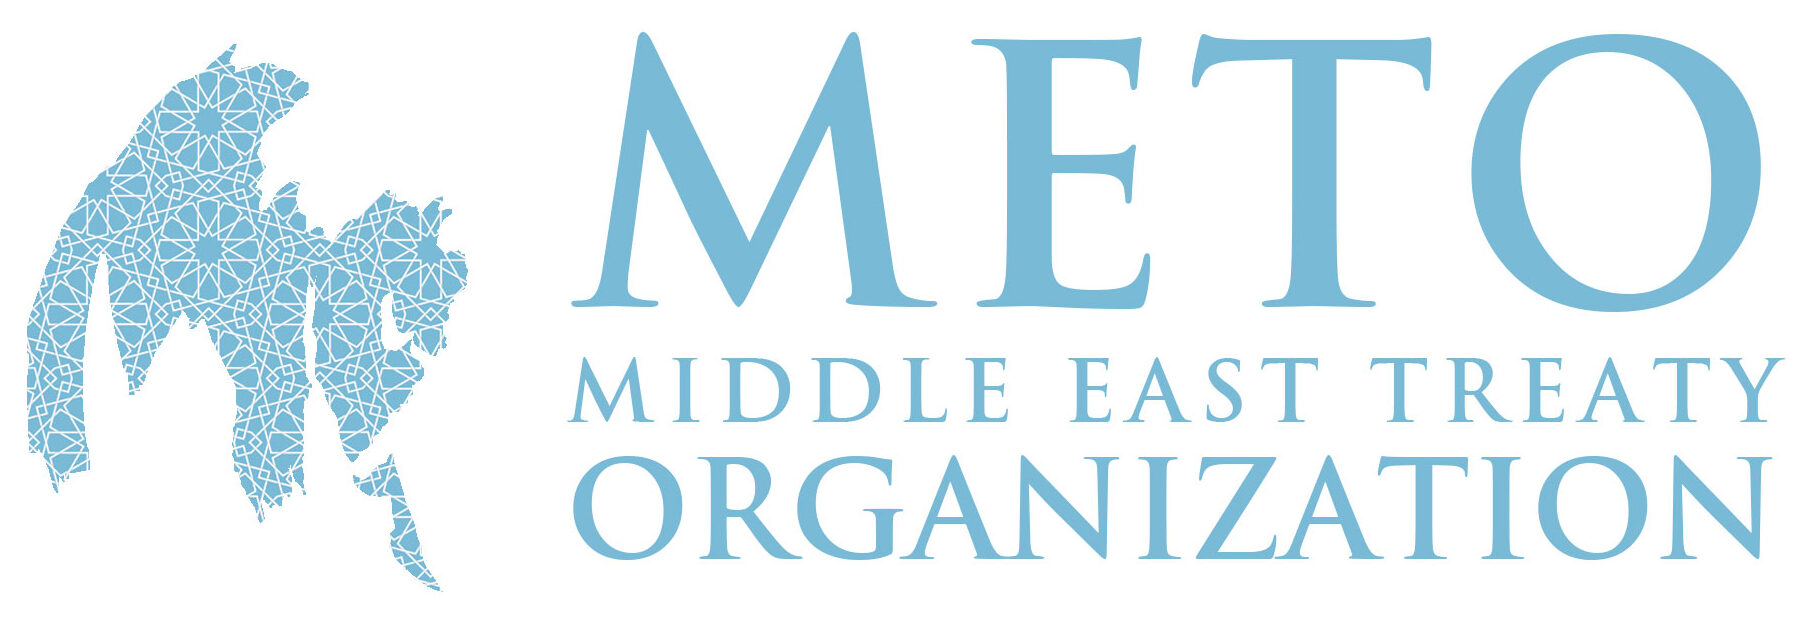 Middle East Treaty Organization